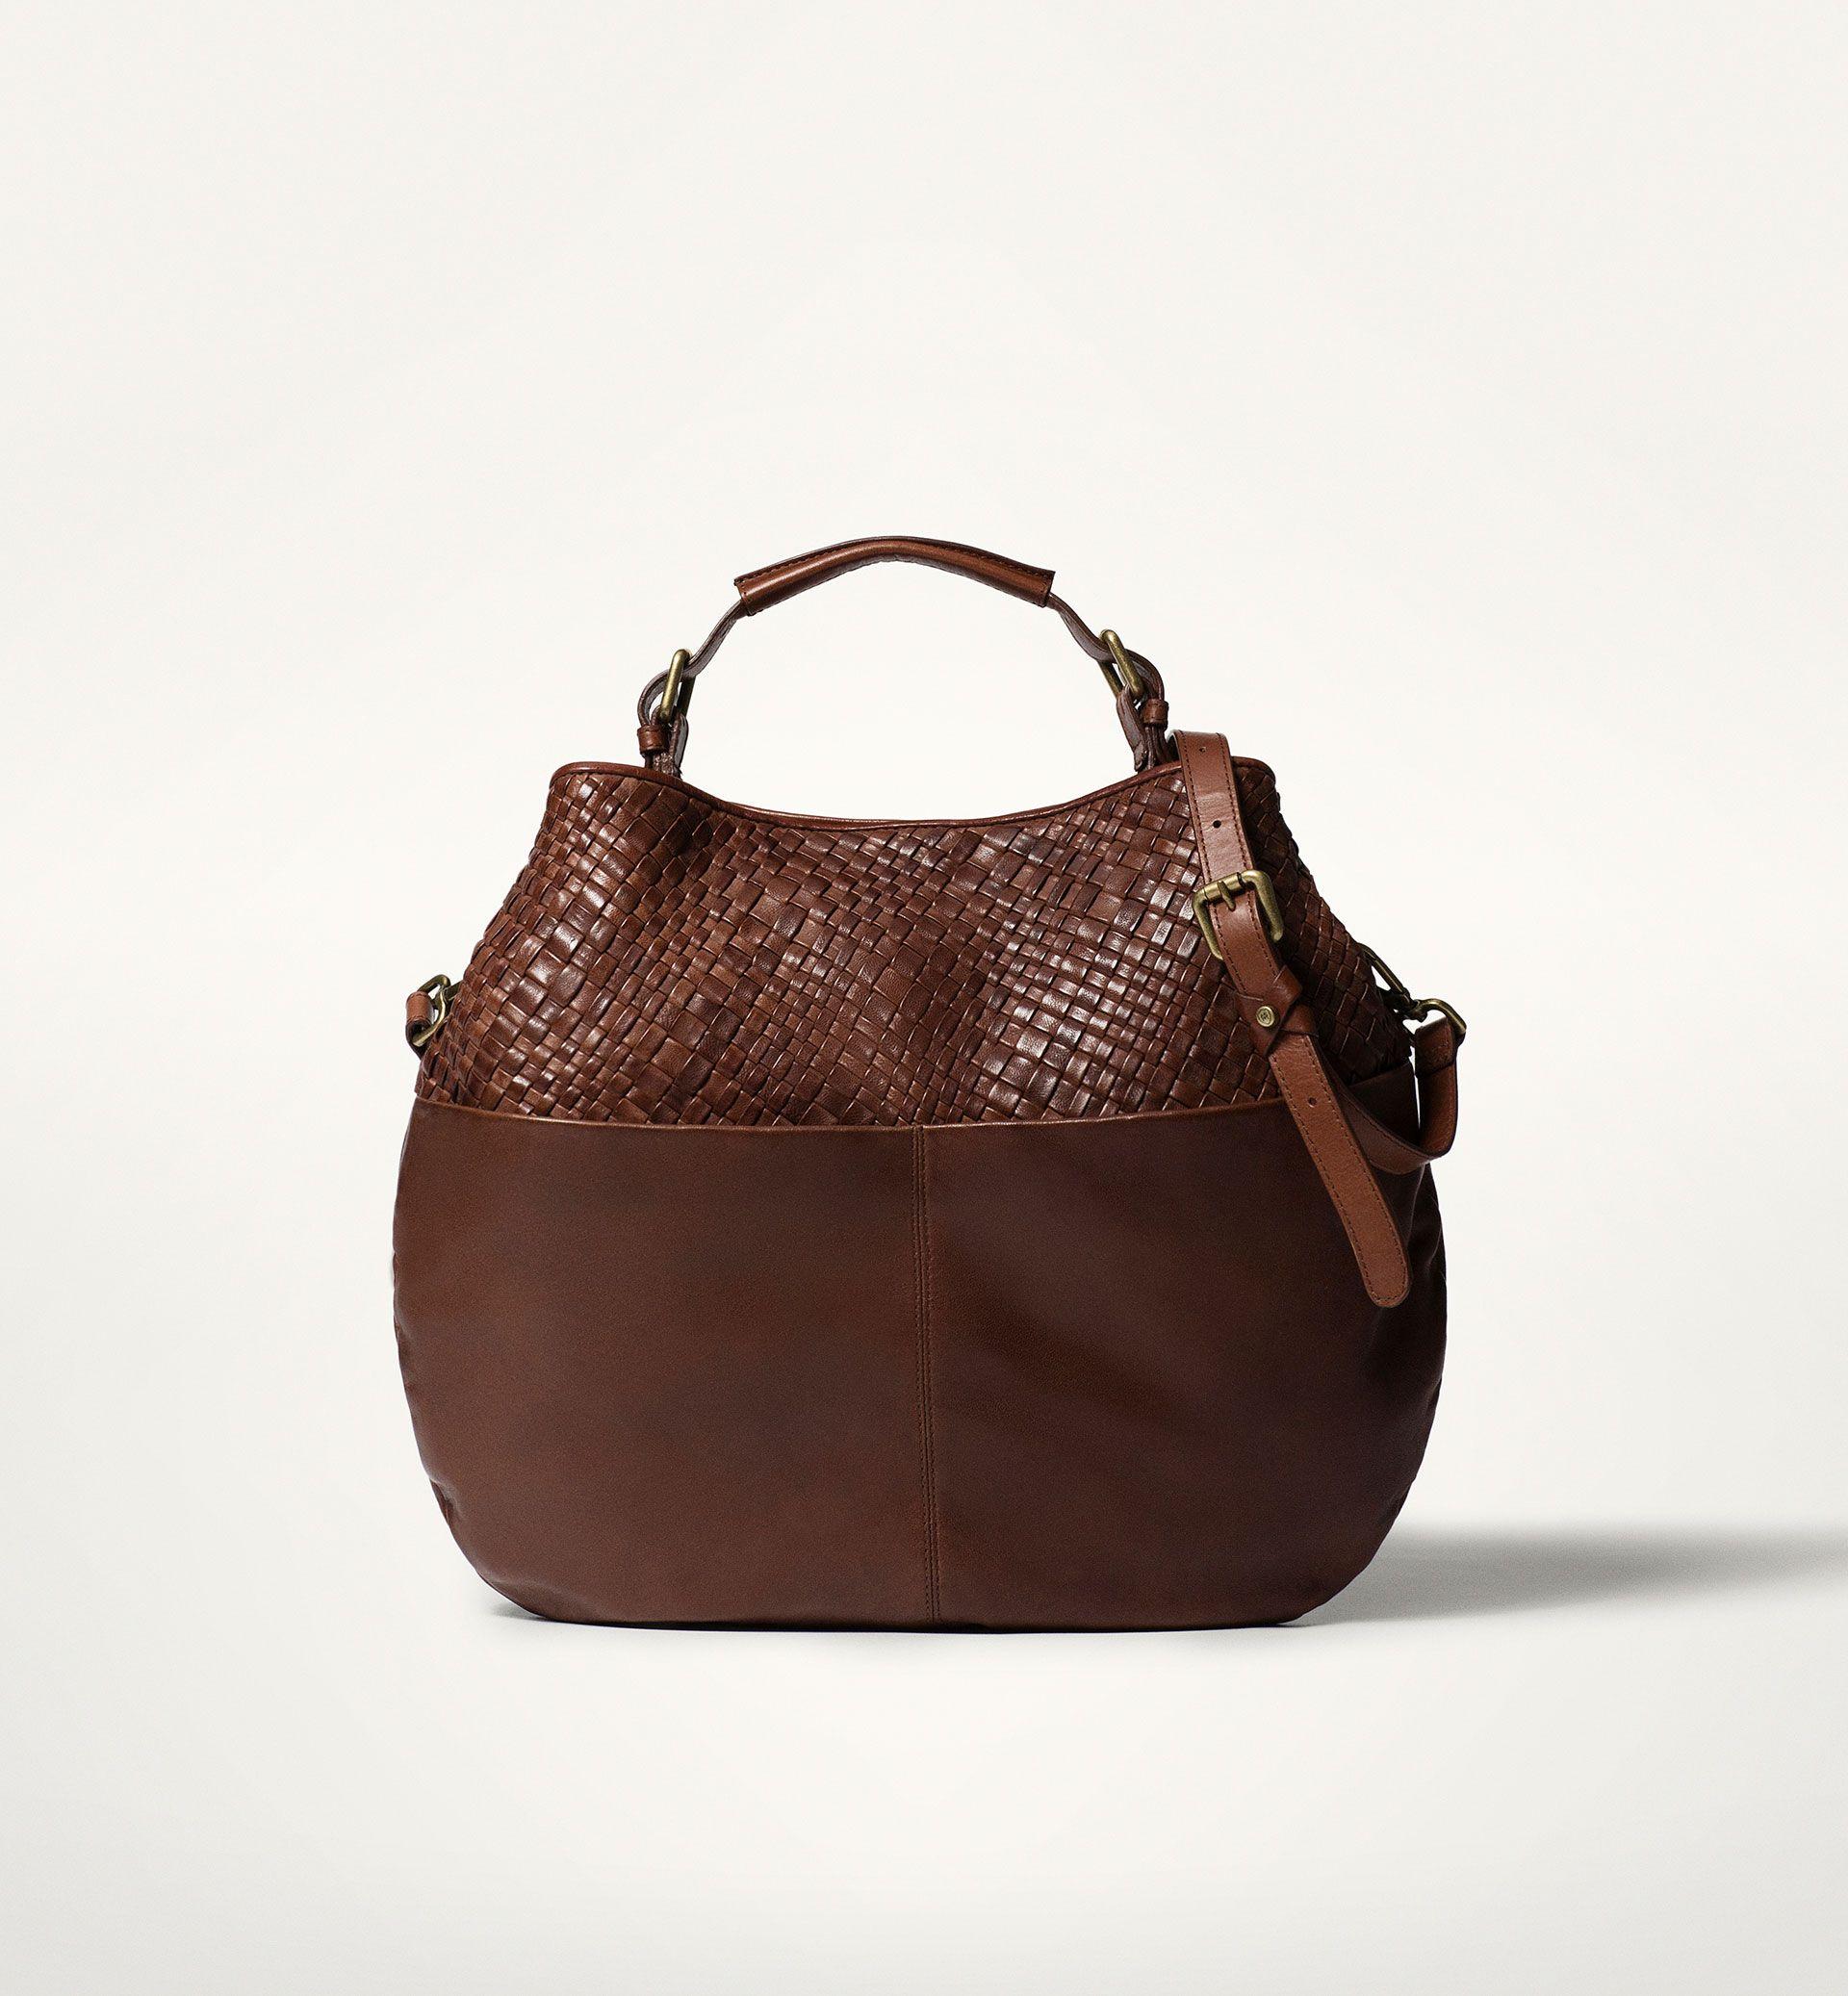 5e74077771b Massimo Dutti dark brown BRAIDED BAG hobo   brown, burgundy, tan ...